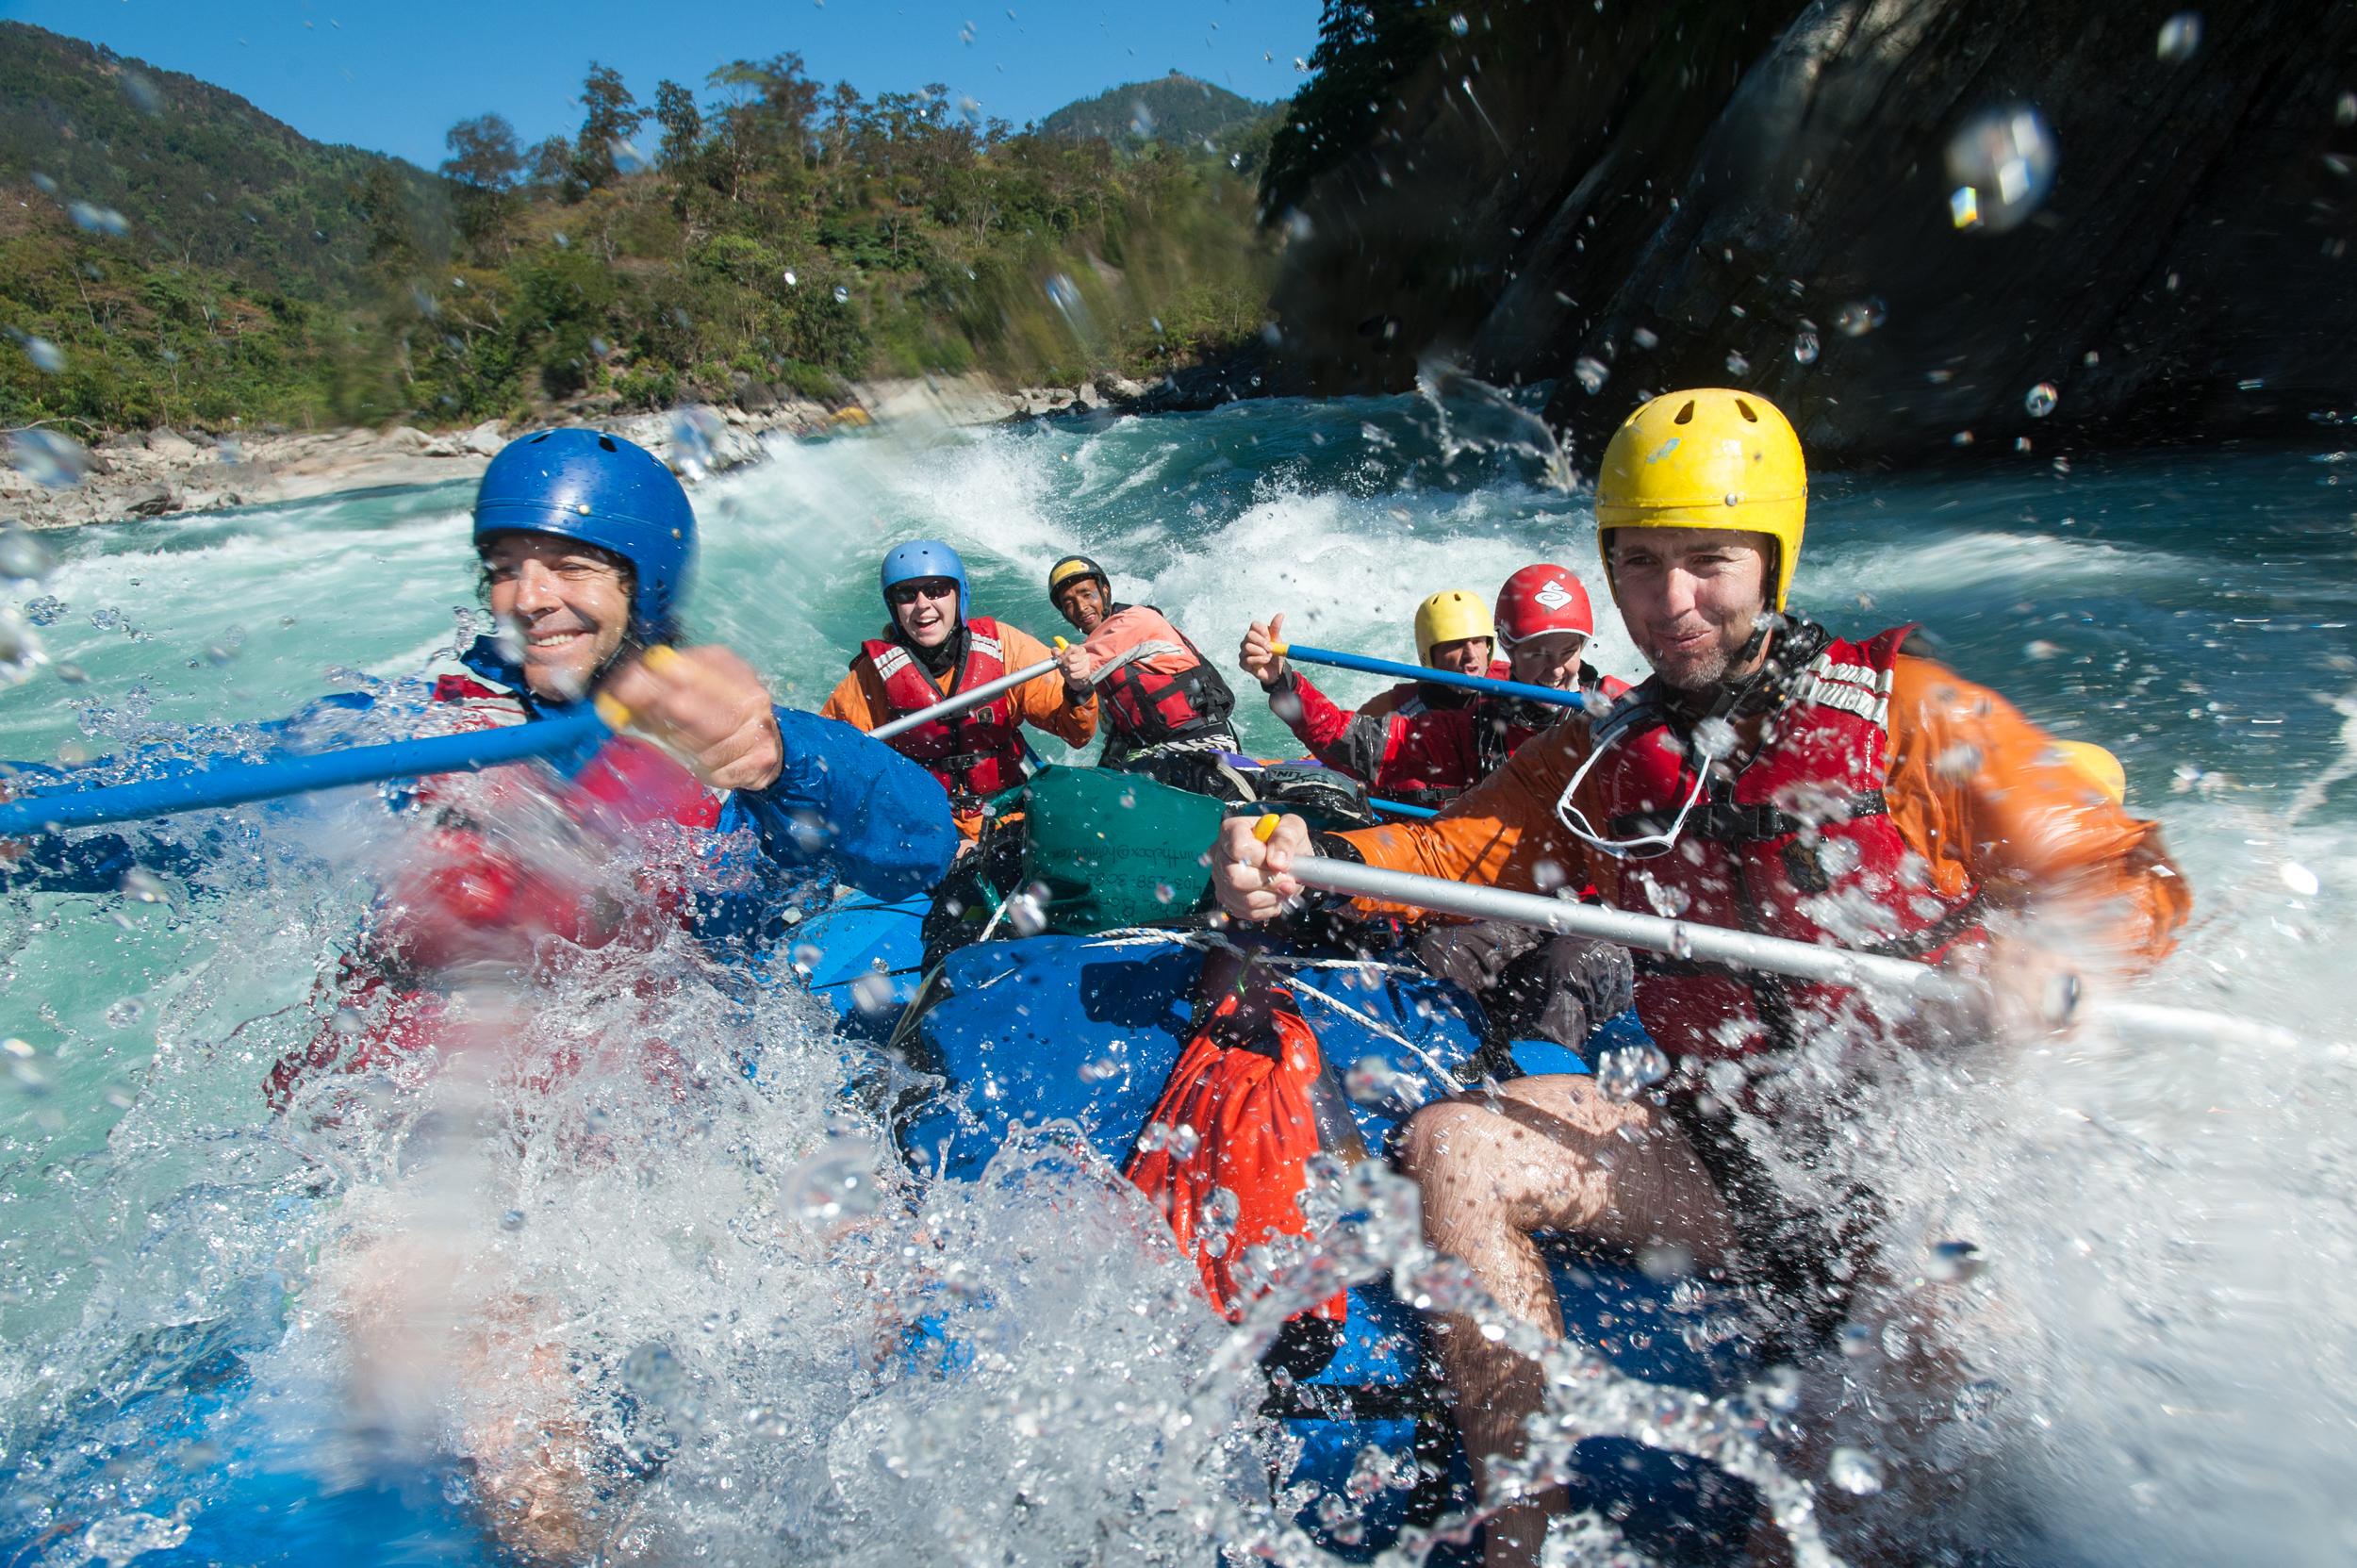 Rafting through Juicer rapid _DSC0668-Edit.jpg